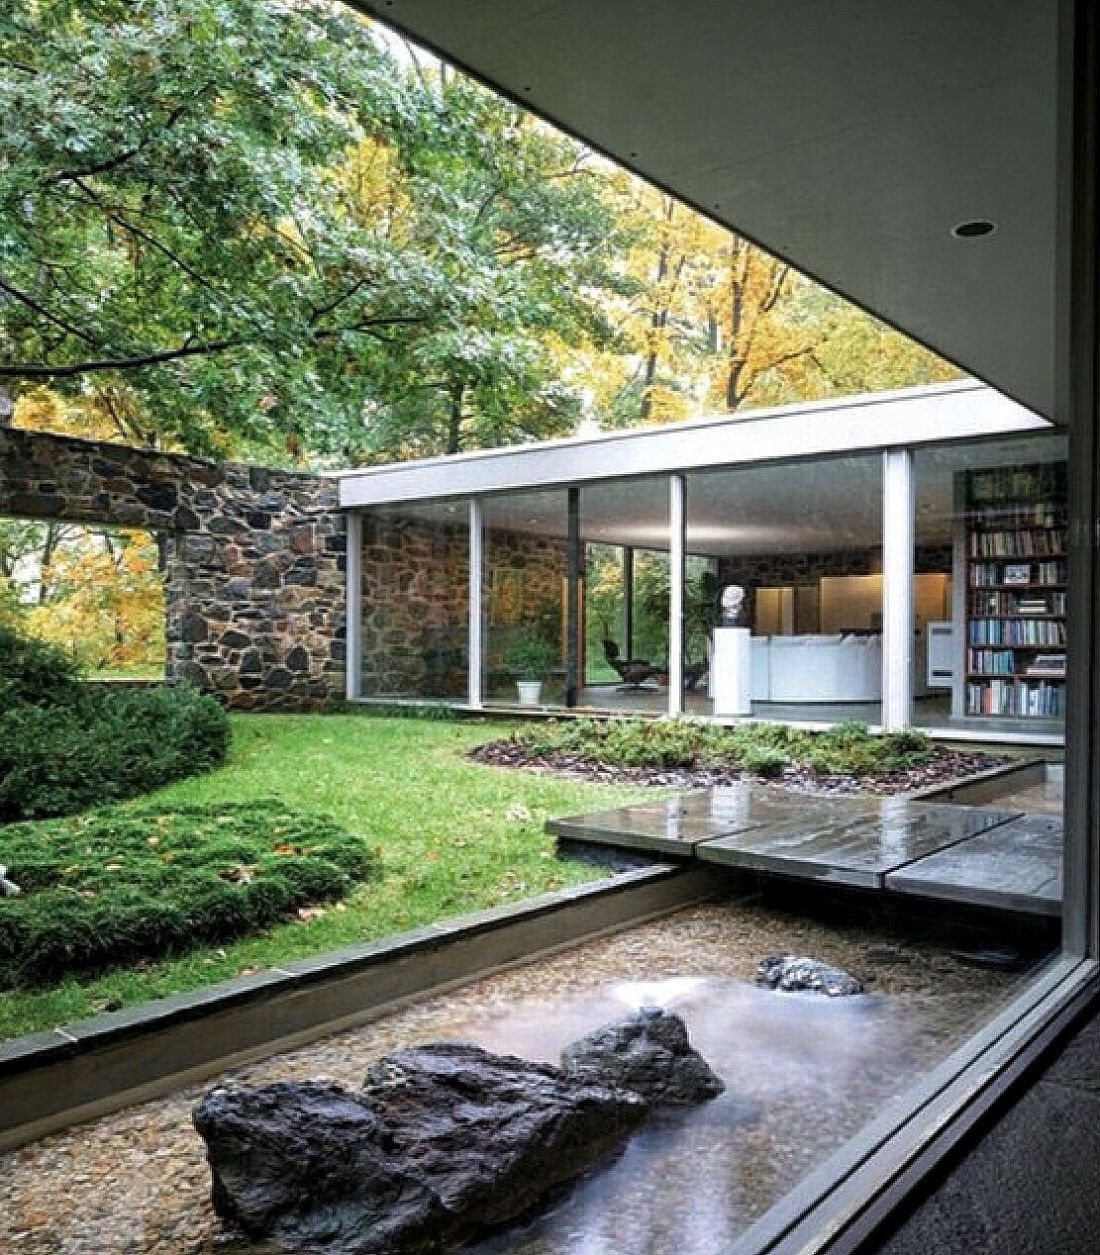 The Hooper House by Marcel Breuer + Herbert Beckhard – Aamodt / Plumb